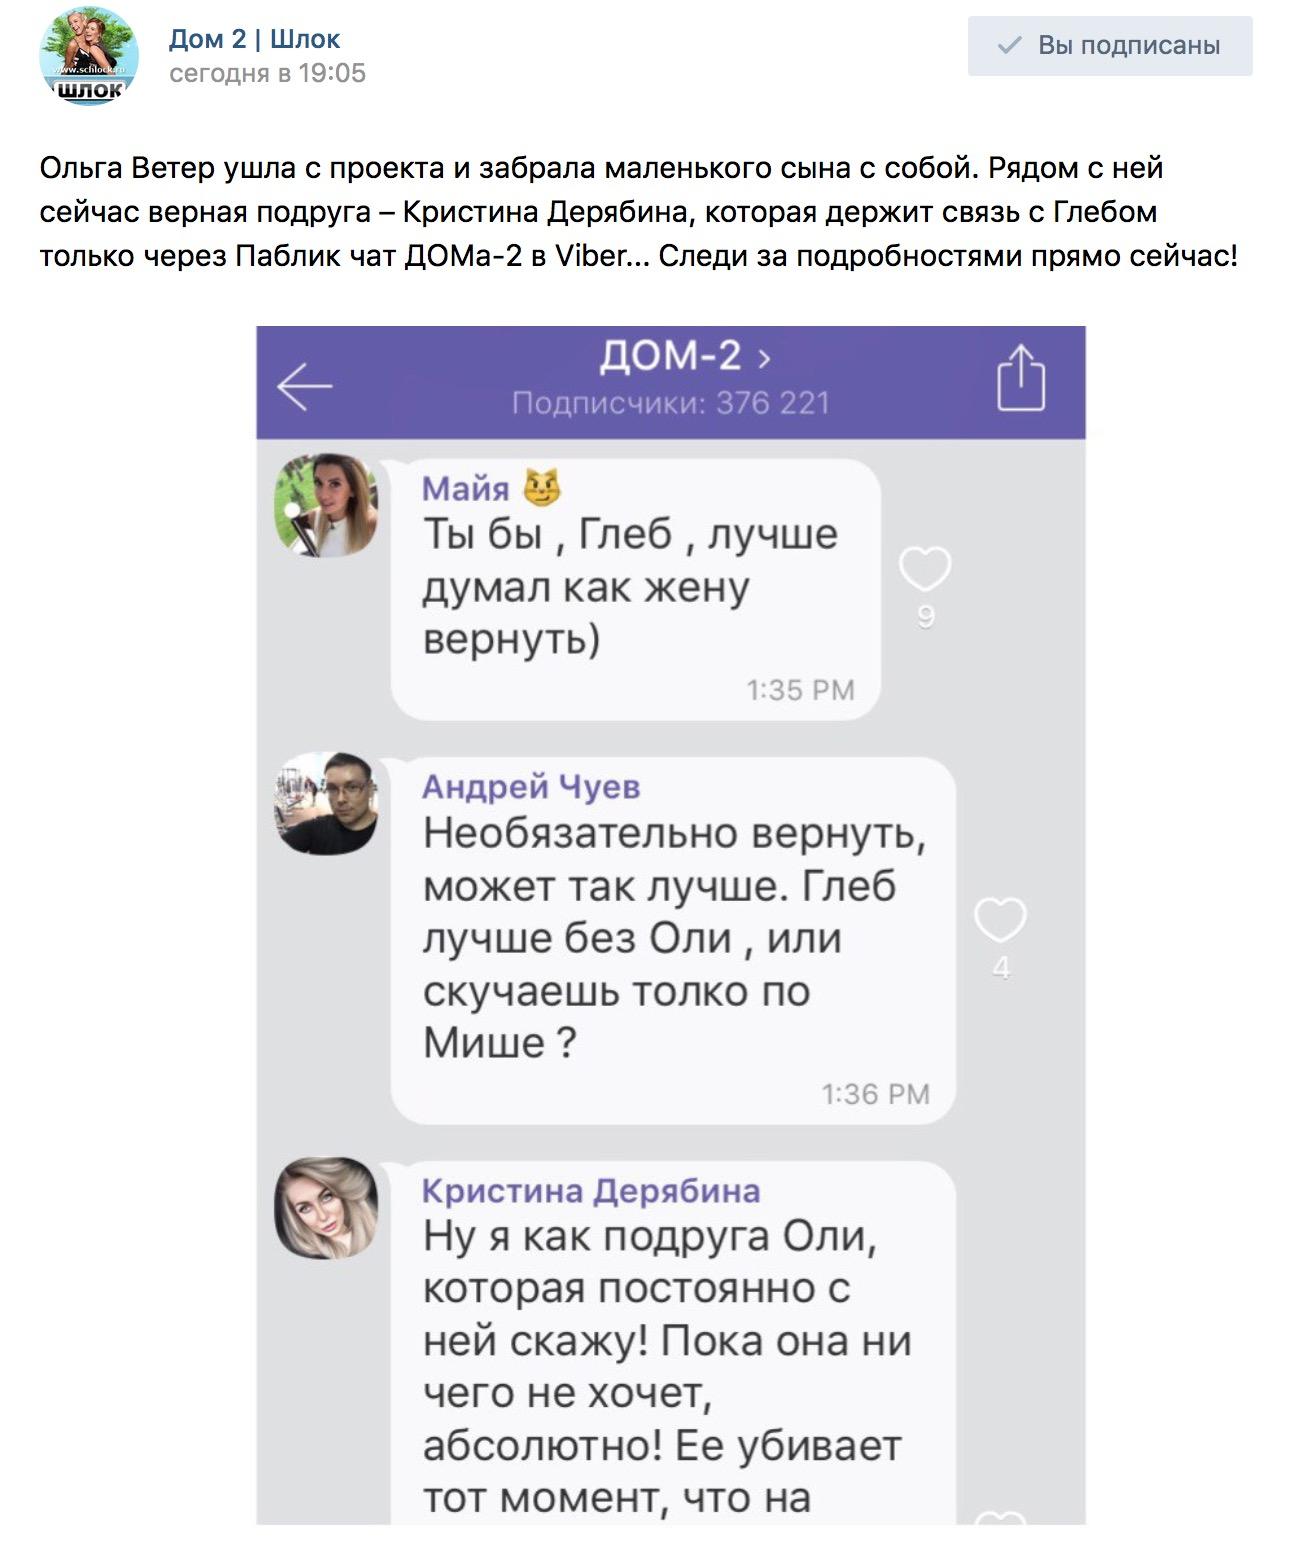 Ольга Ветер ушла с проекта